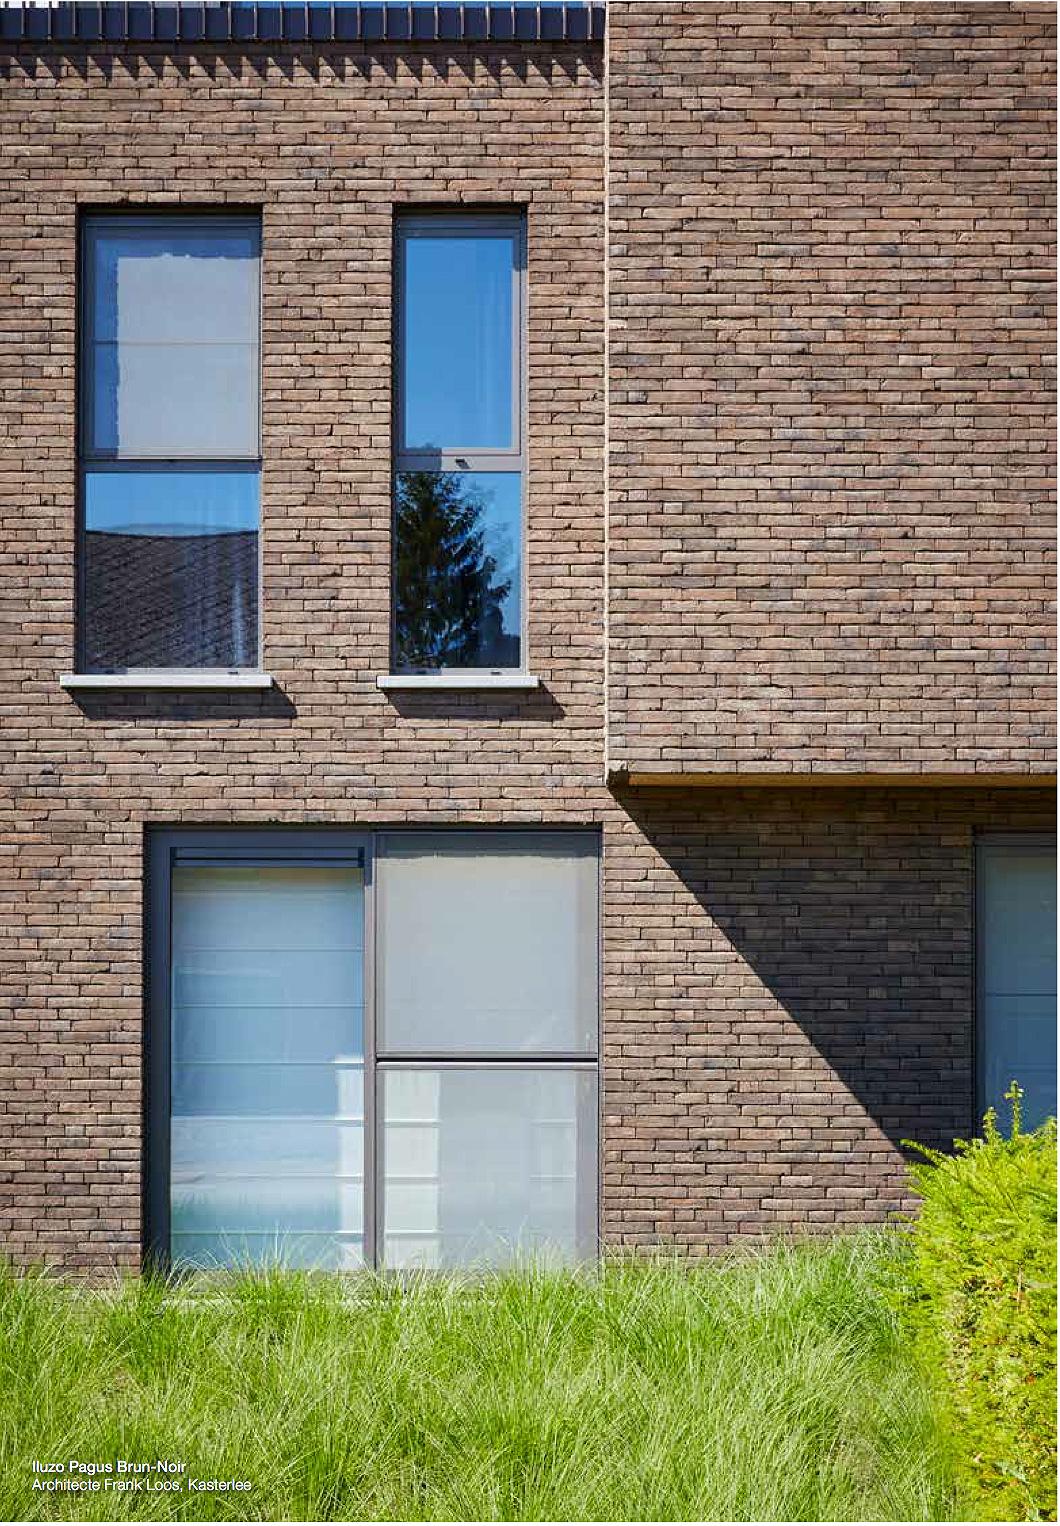 ditail-materiales-contruccion-wienerberger-pr_ter_2015_iluzo-pagus-grijs-zwart-gevoegd